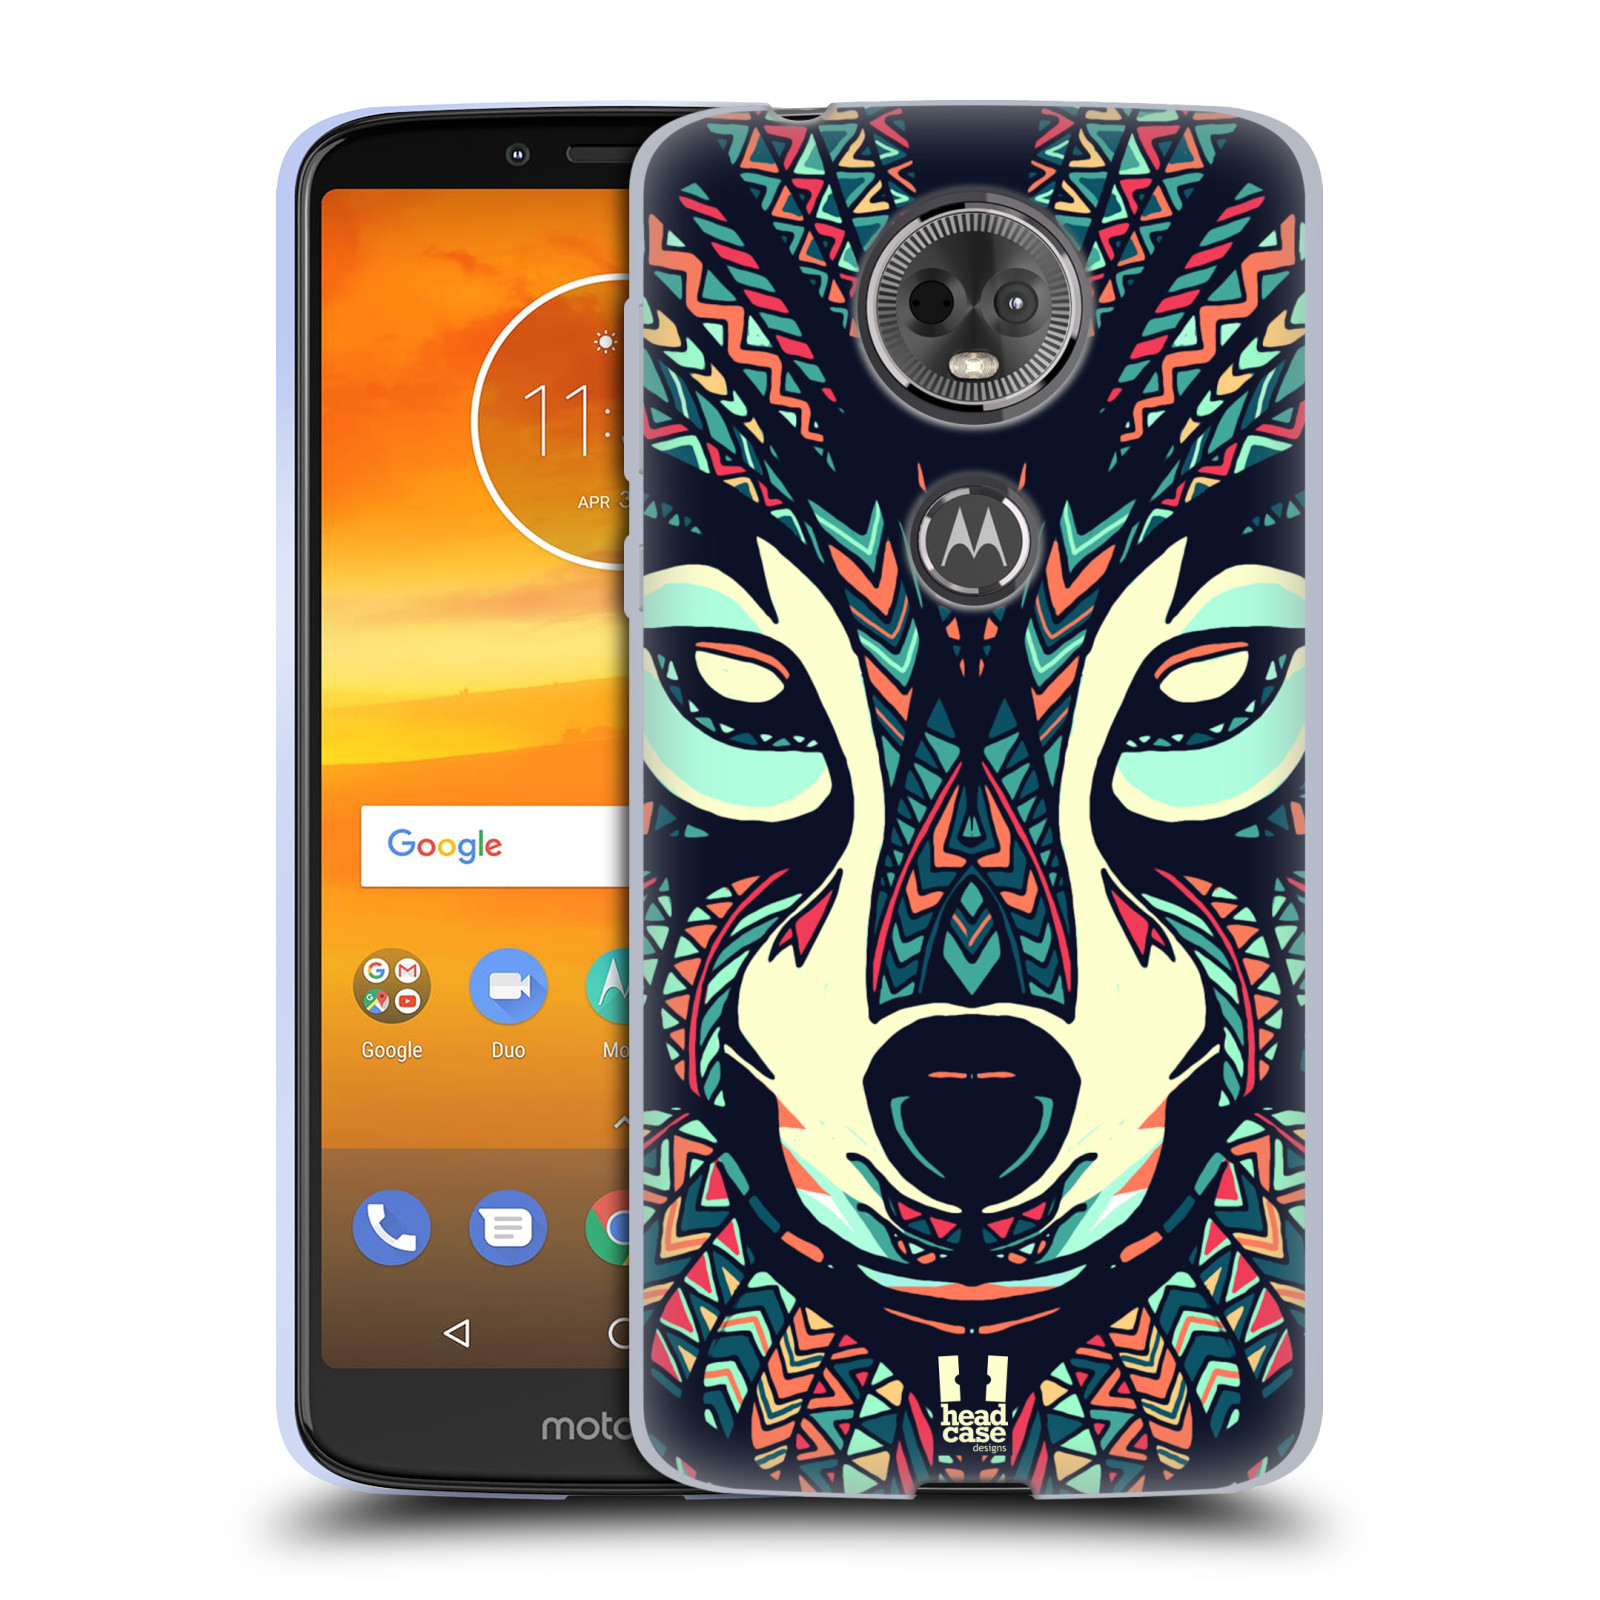 Silikonové pouzdro na mobil Motorola Moto E5 Plus - Head Case - AZTEC VLK (Silikonový kryt či obal na mobilní telefon Lenovo Moto E5 Plus s motivem AZTEC VLK)